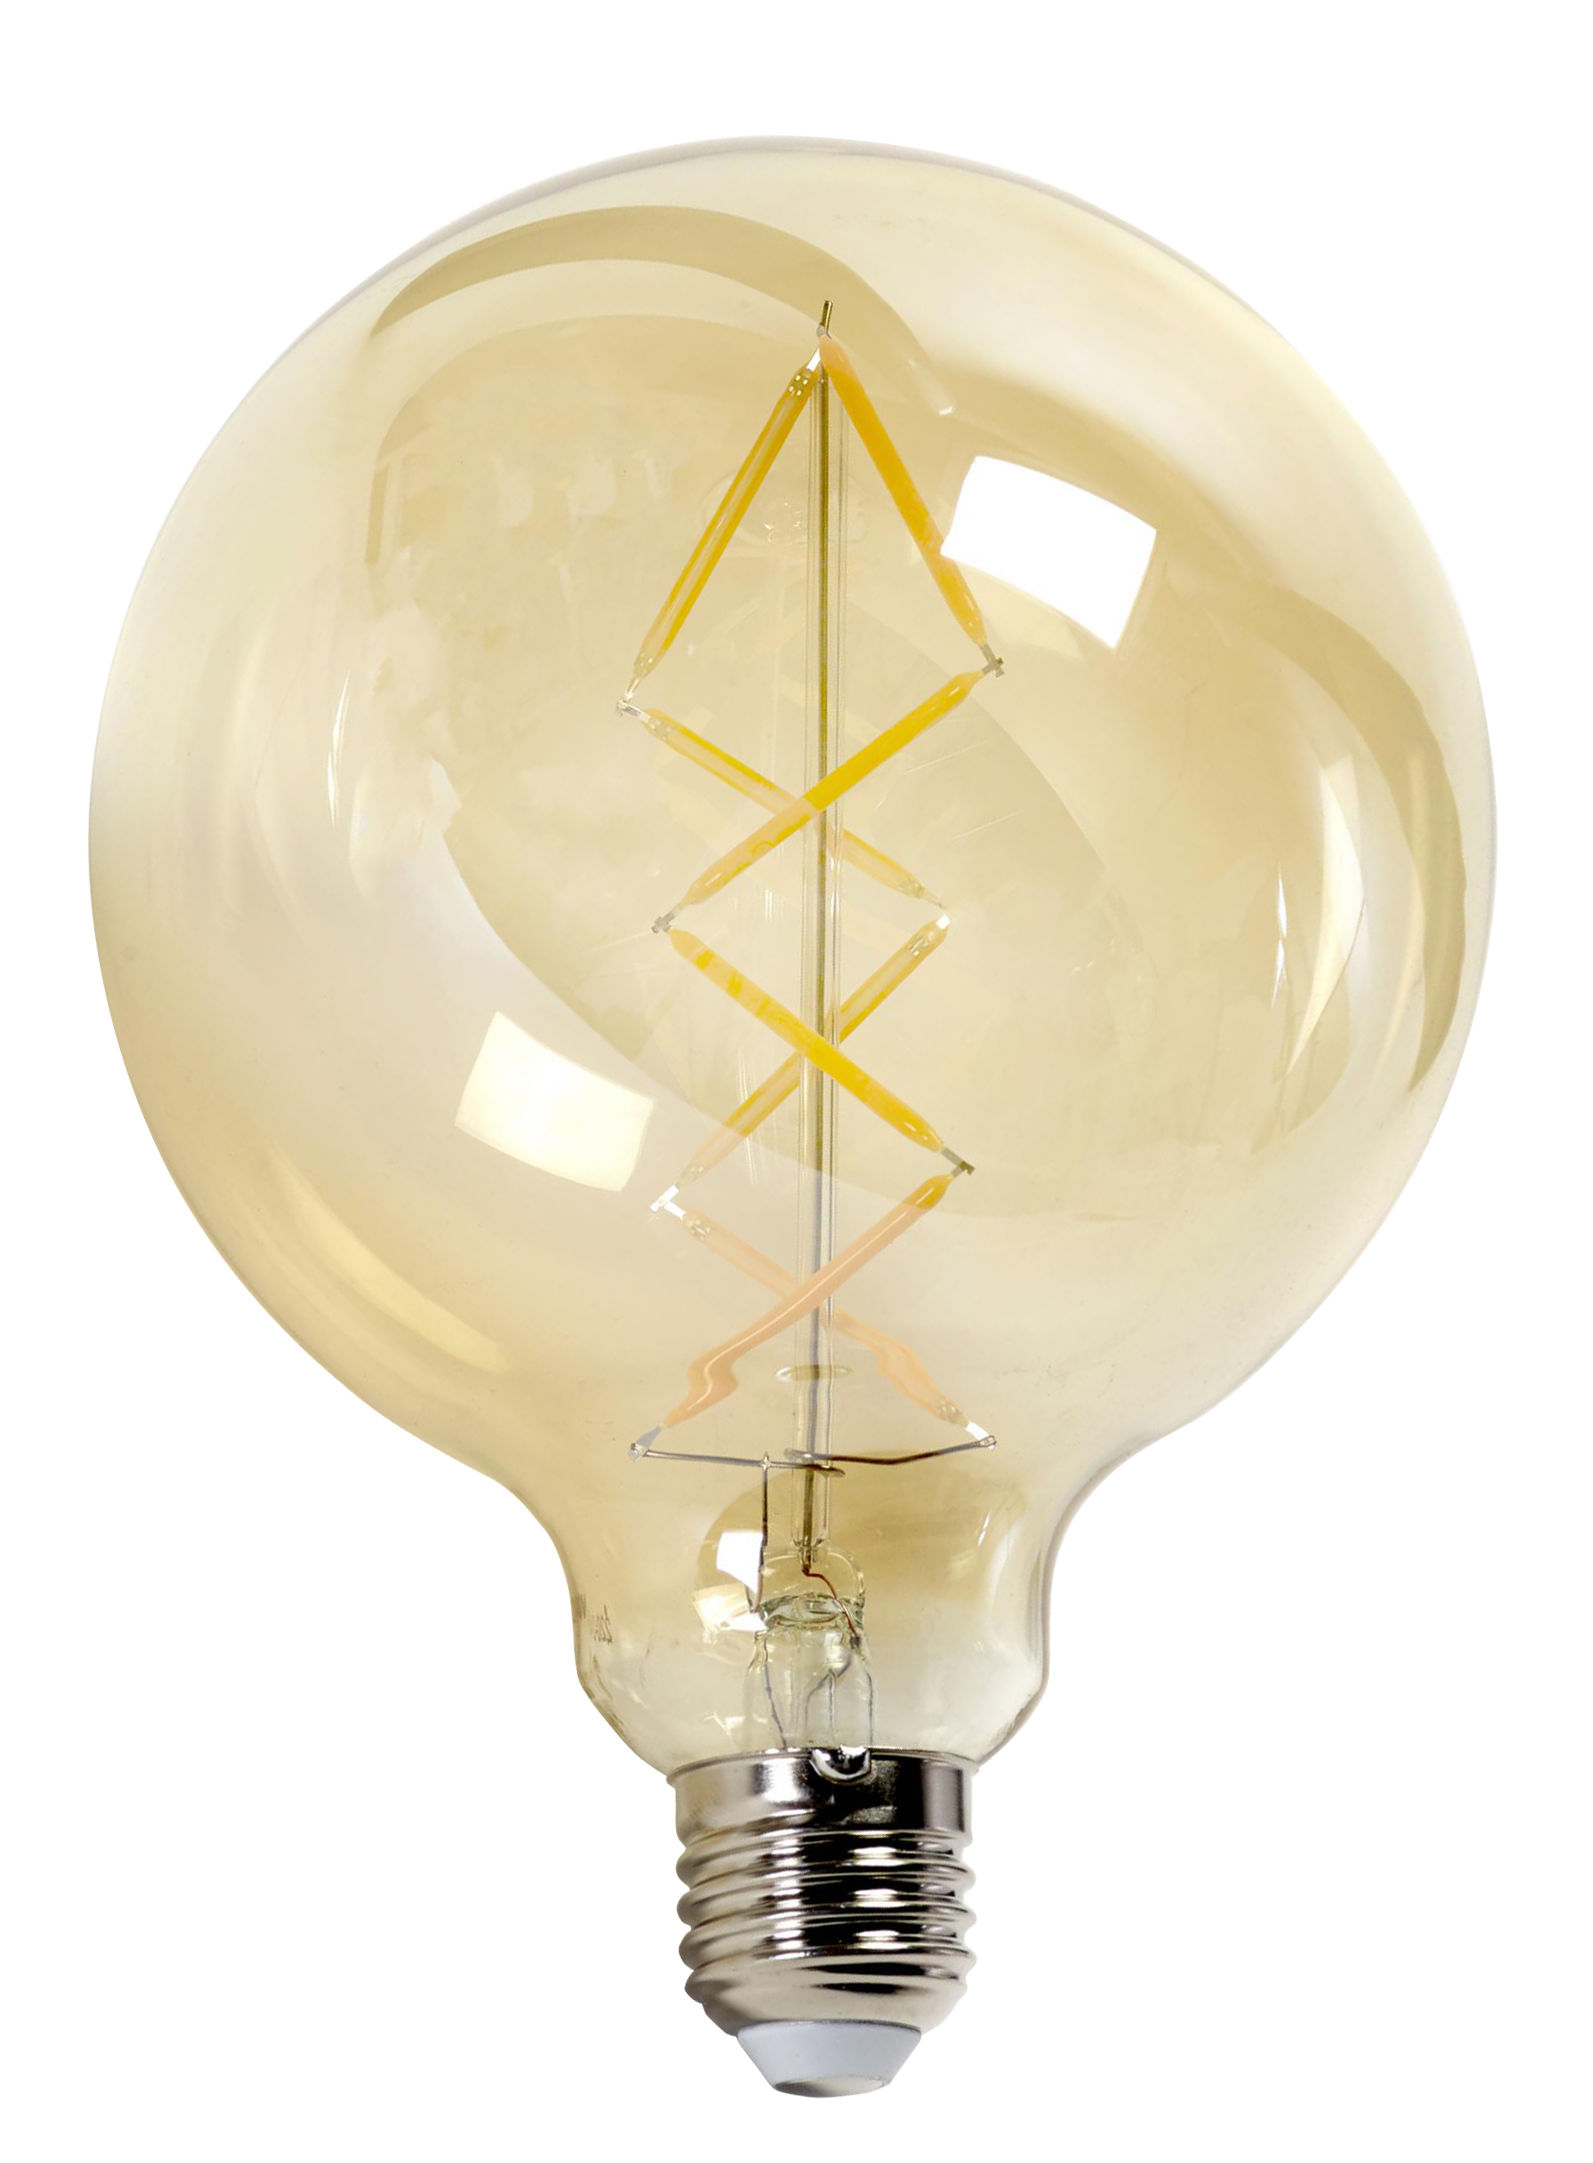 Studio Serax Edison 2w Lampe Filaments Simple Pour Led E27 Ampoule Baladeuseamp; iuOXkZwTP